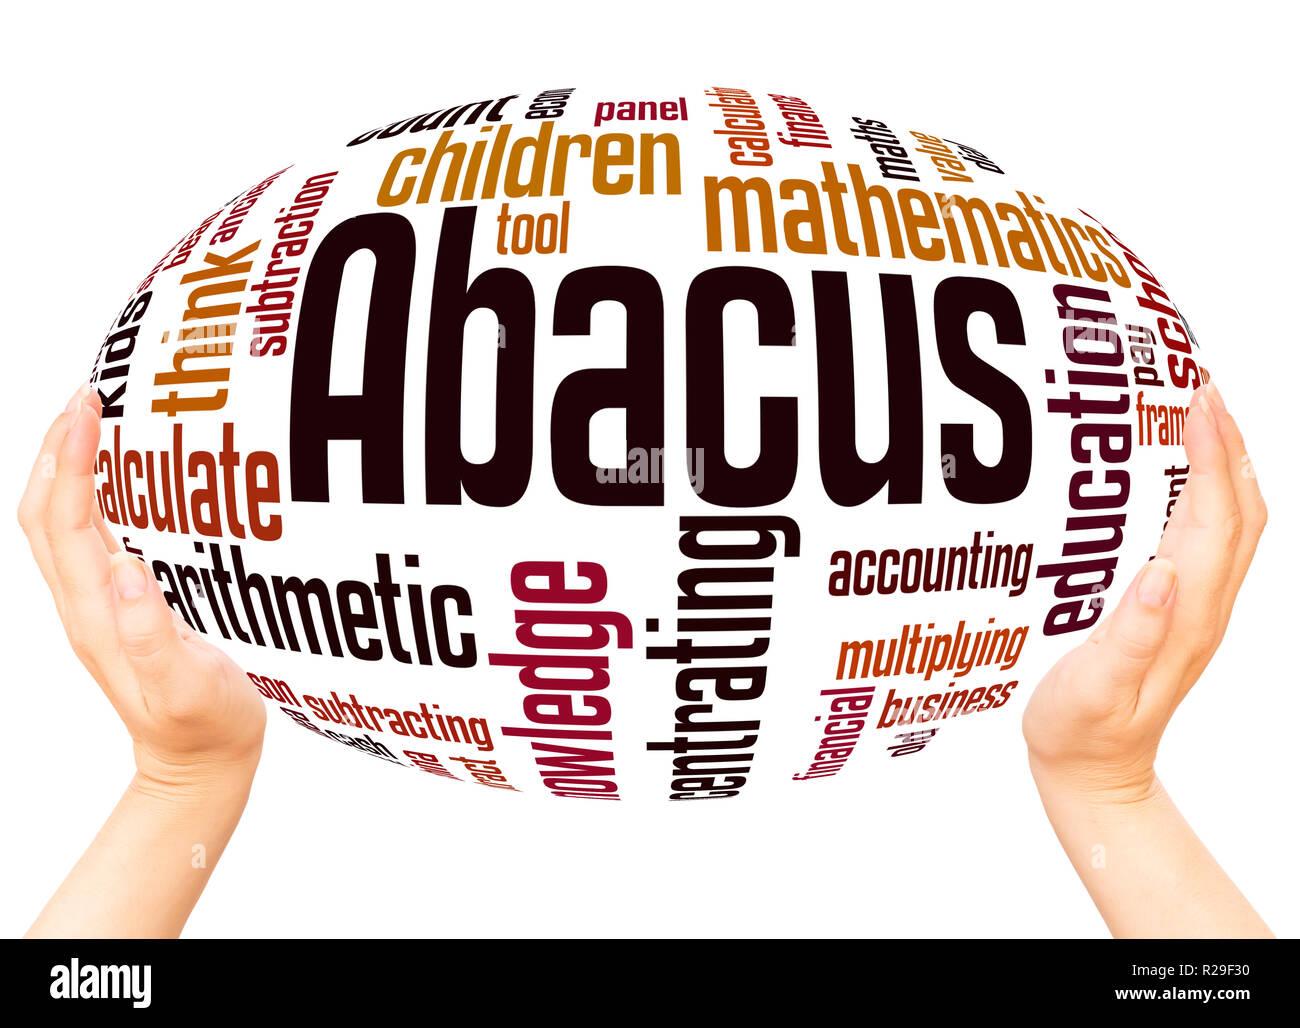 Abacus - boliche, palabra nube esfera mano concepto sobre fondo blanco. Foto de stock